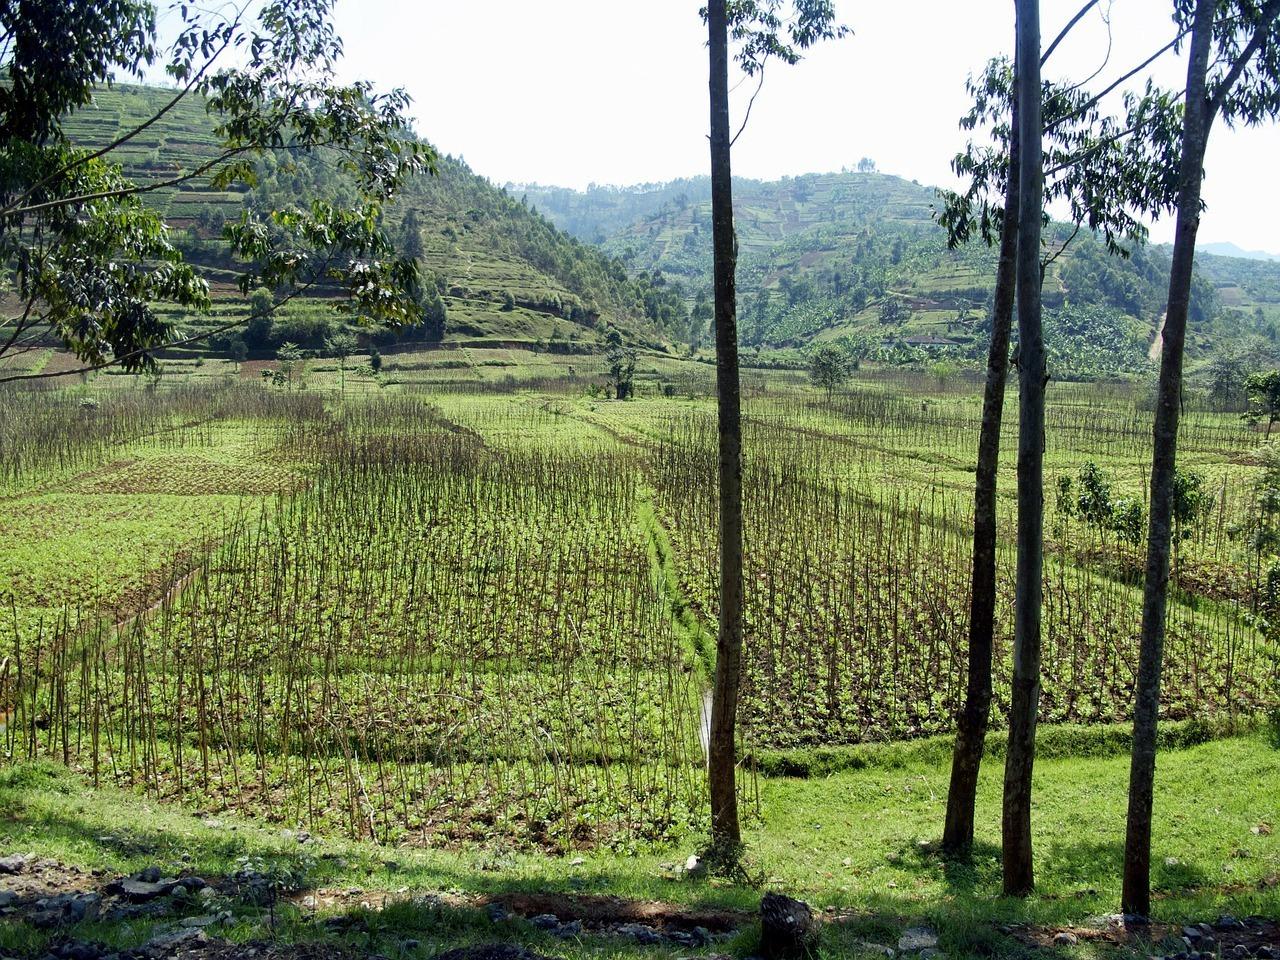 Rwanda Landscape - Safe African Countries